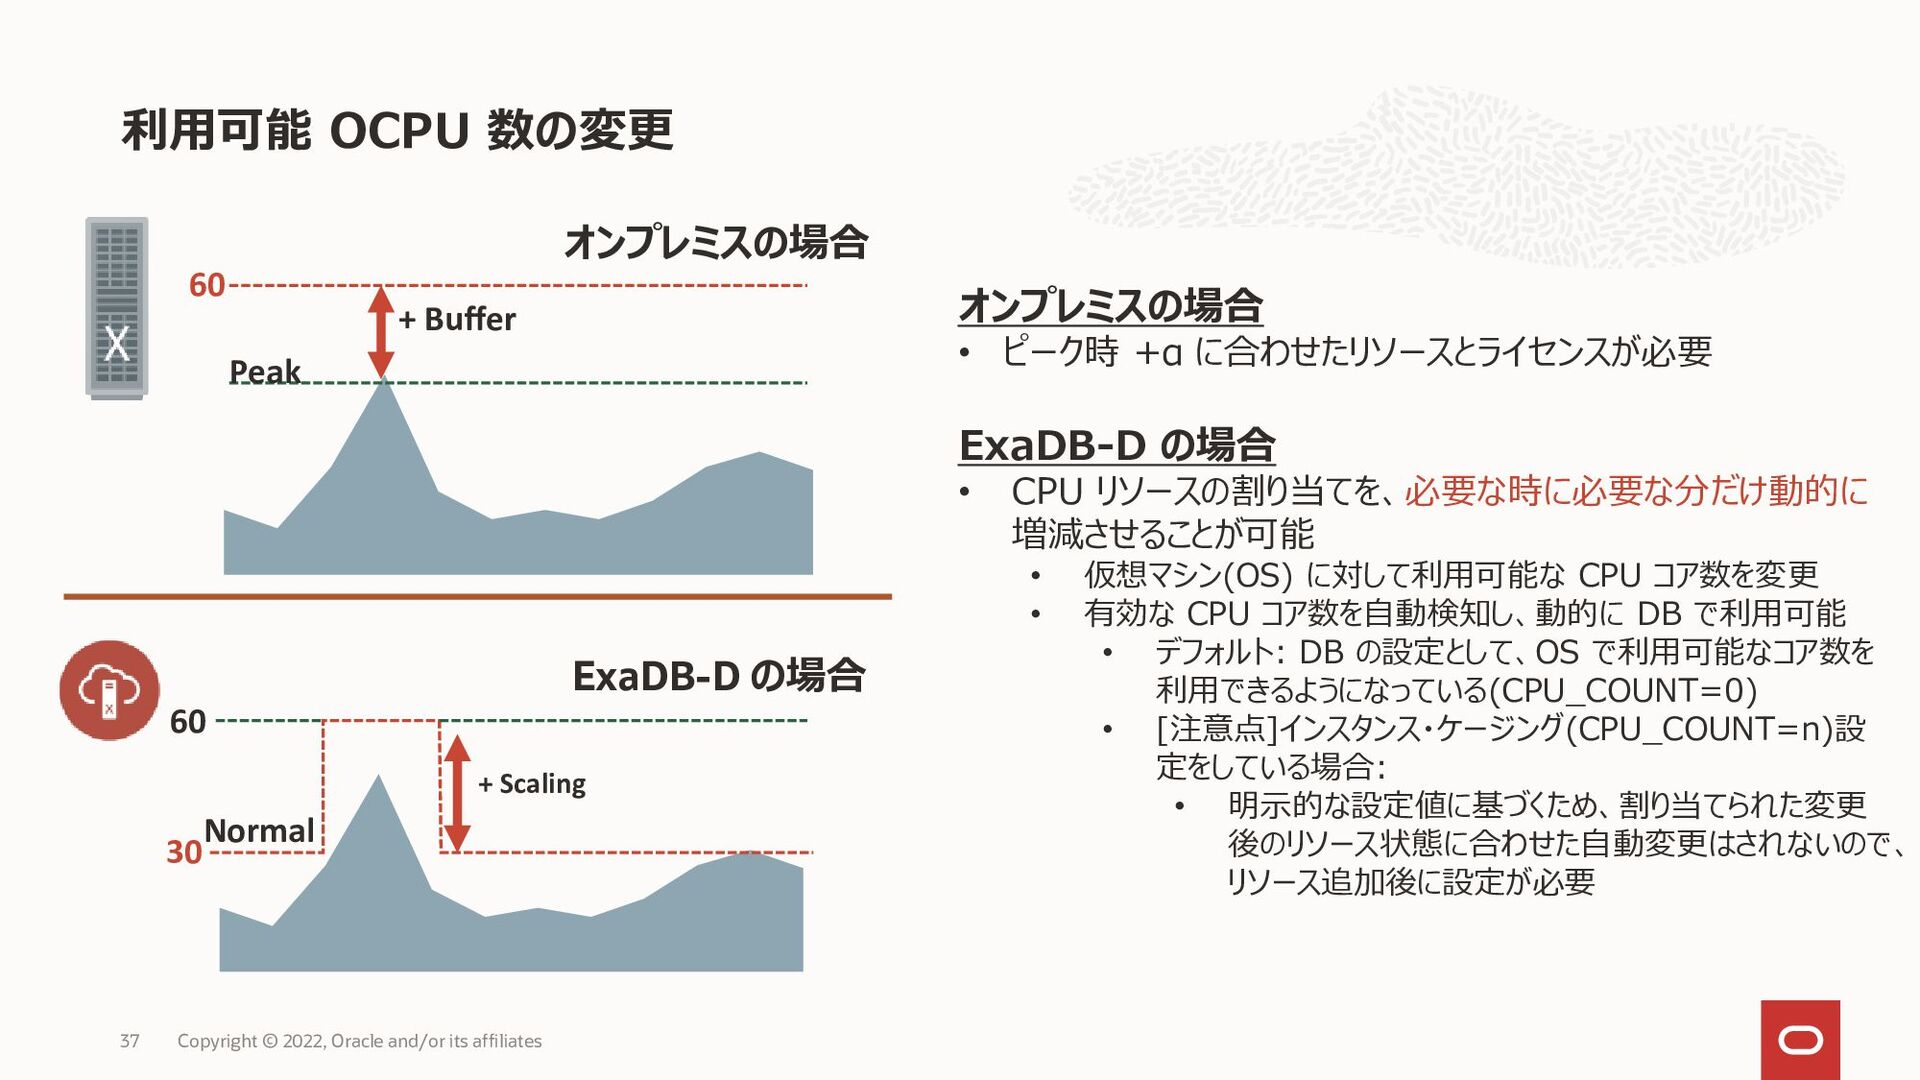 Exadata VM クラスタで利用可能なOCPU数 • 各 VM には等しい数の OCPU ...